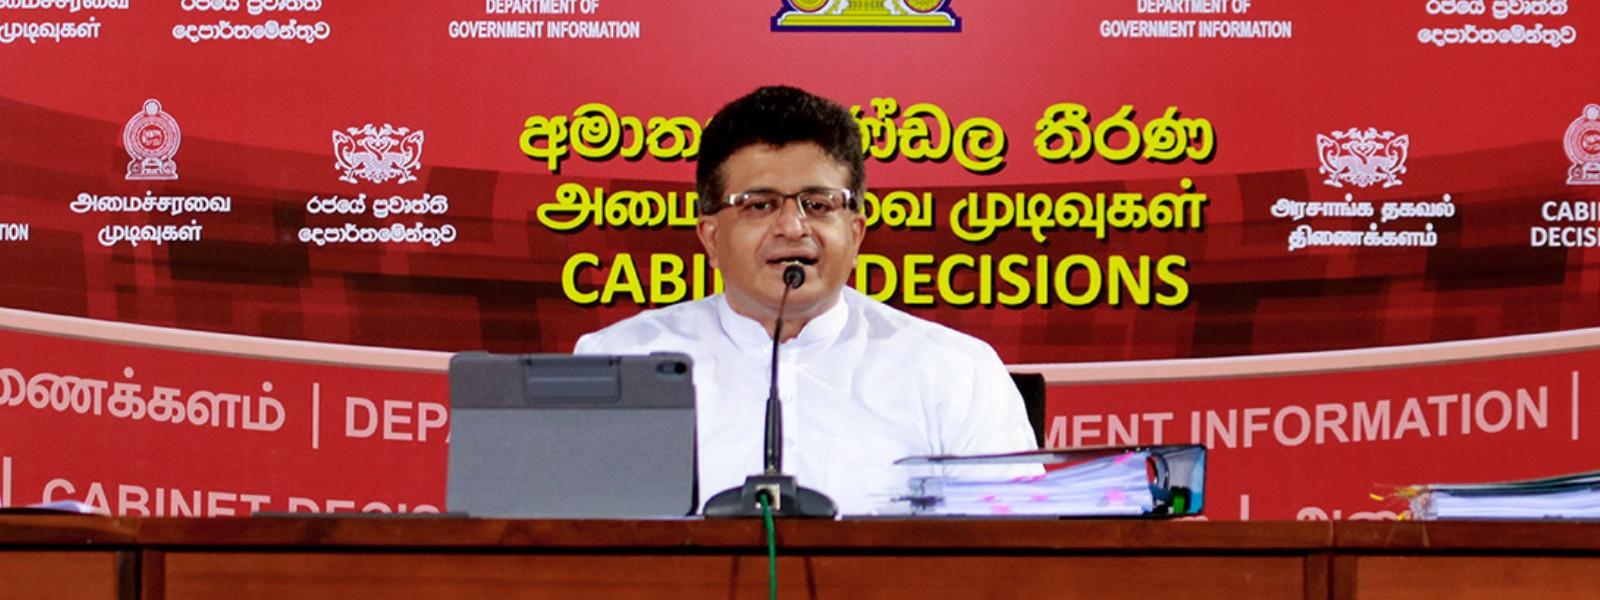 Sri Lanka's Energy Minister declares NO money for fuel